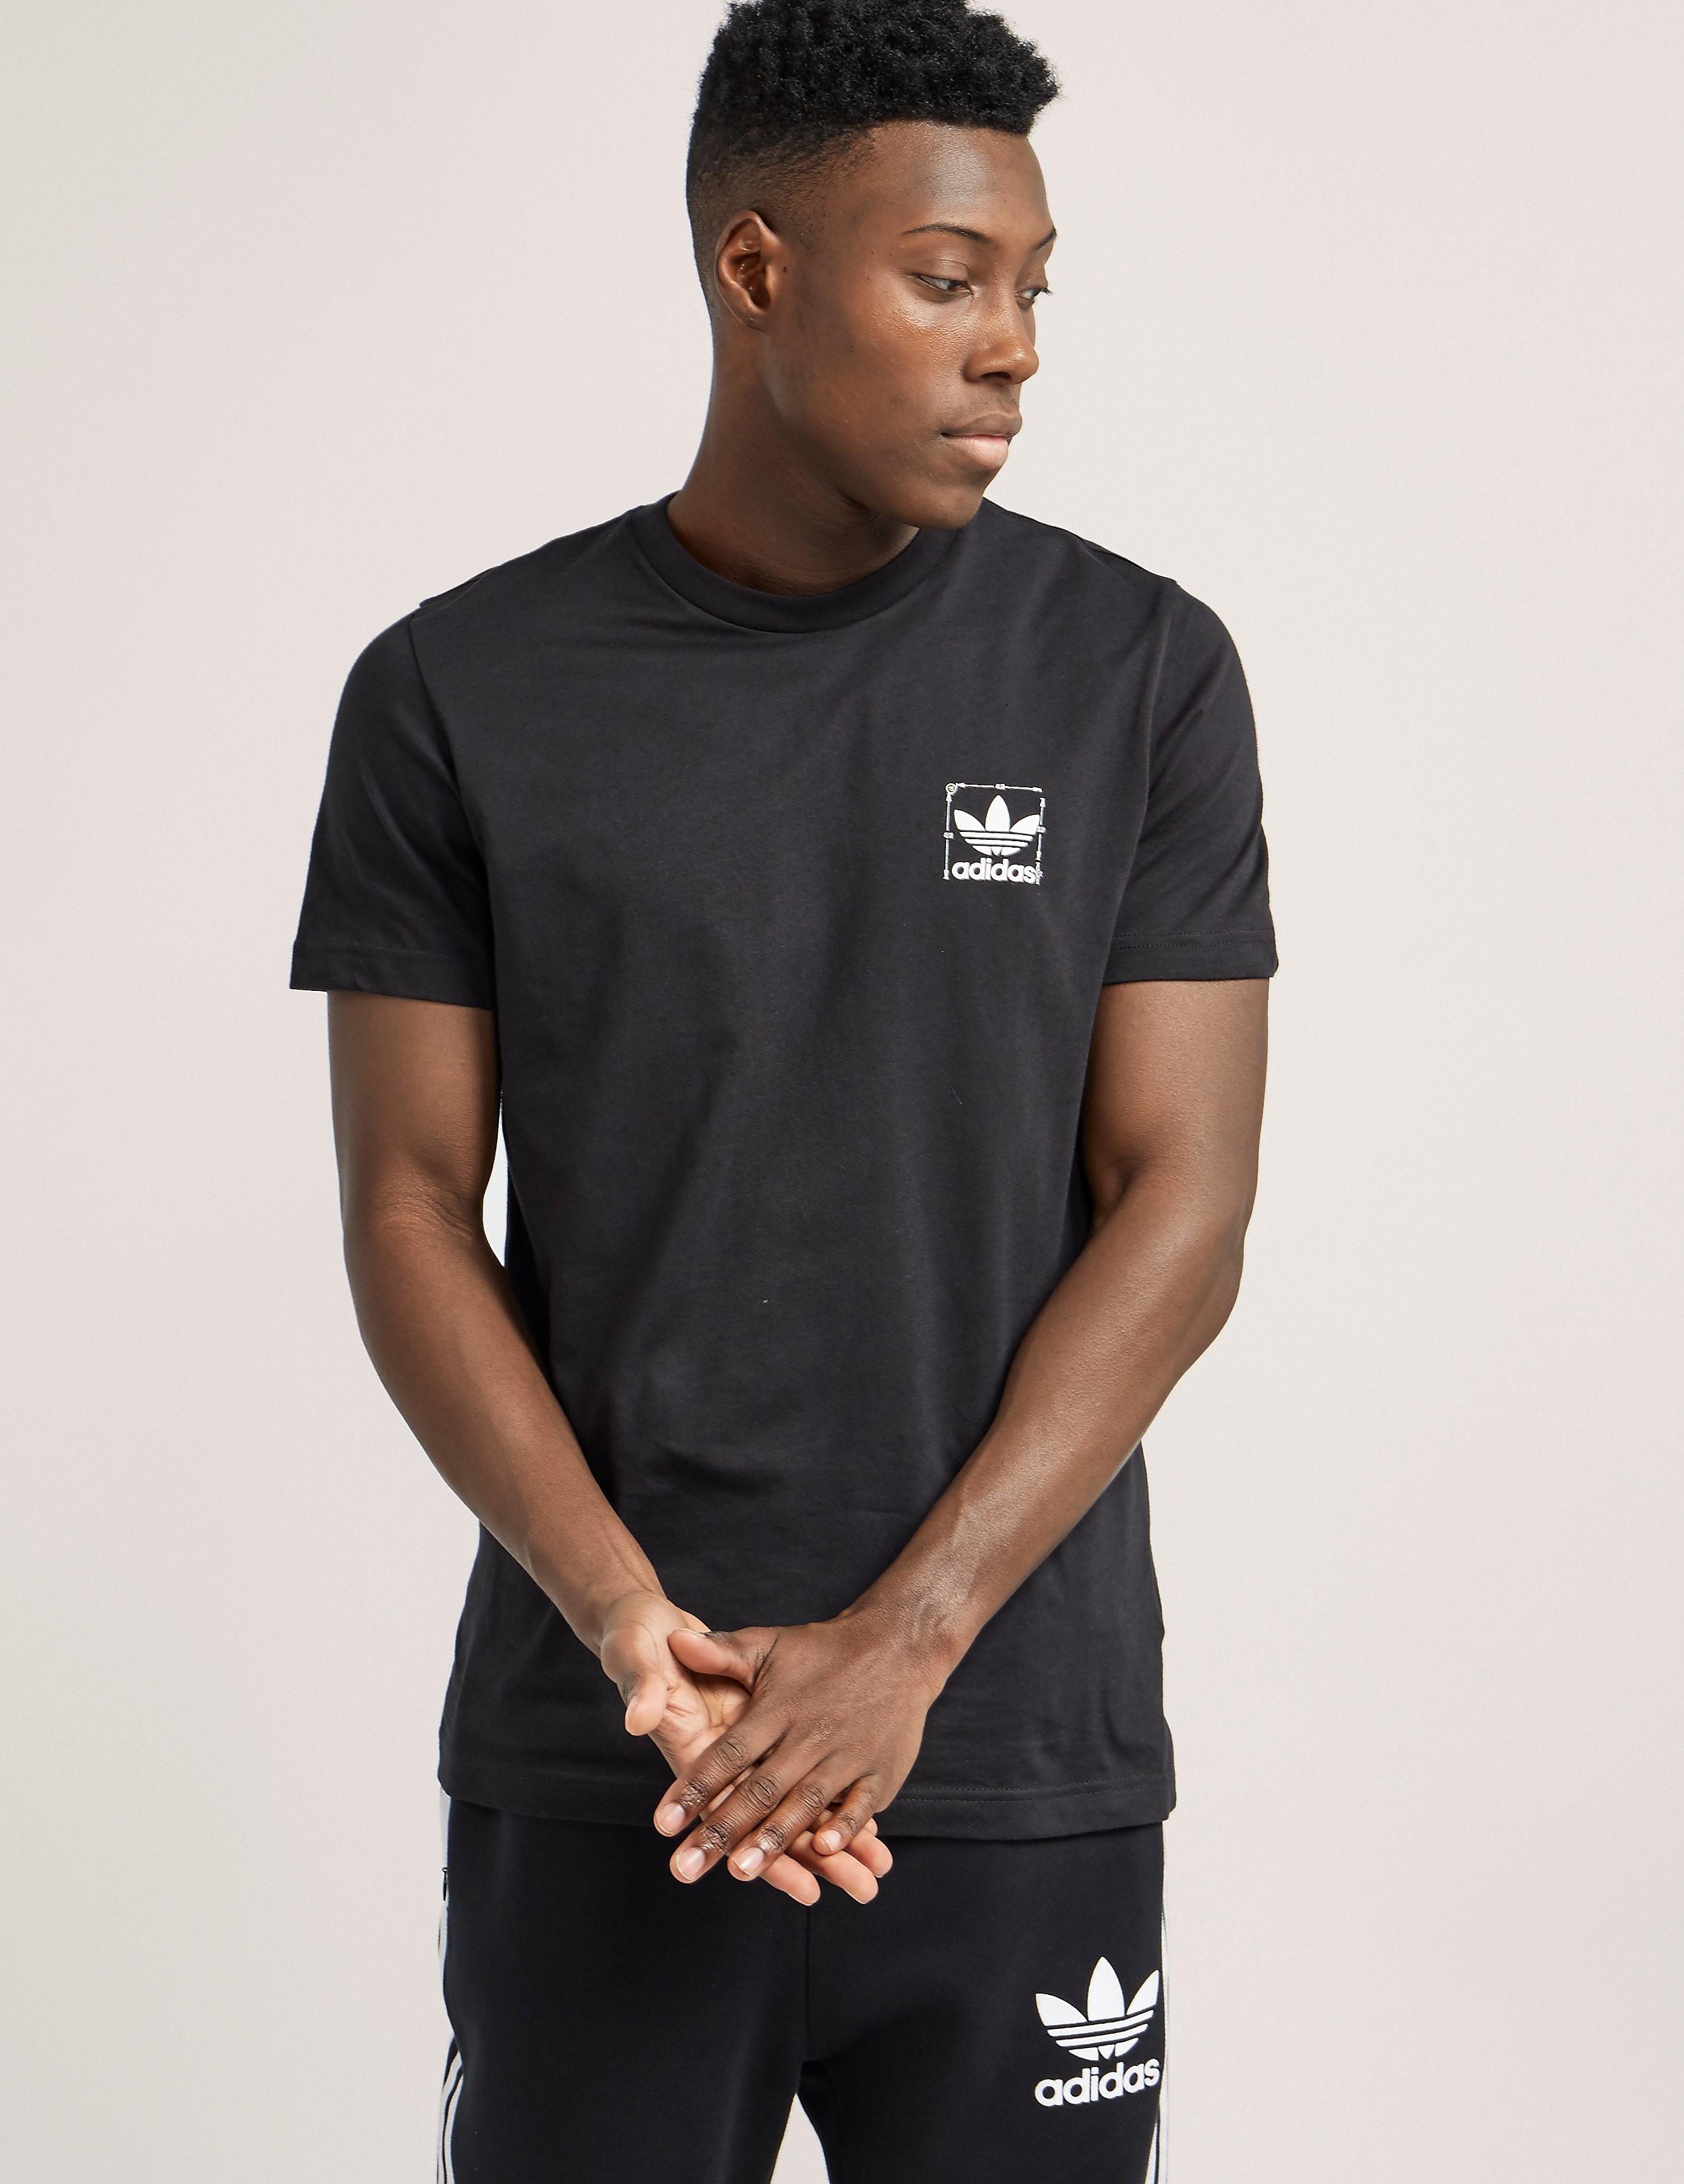 adidas Originals Scale Graphic T-Shirt